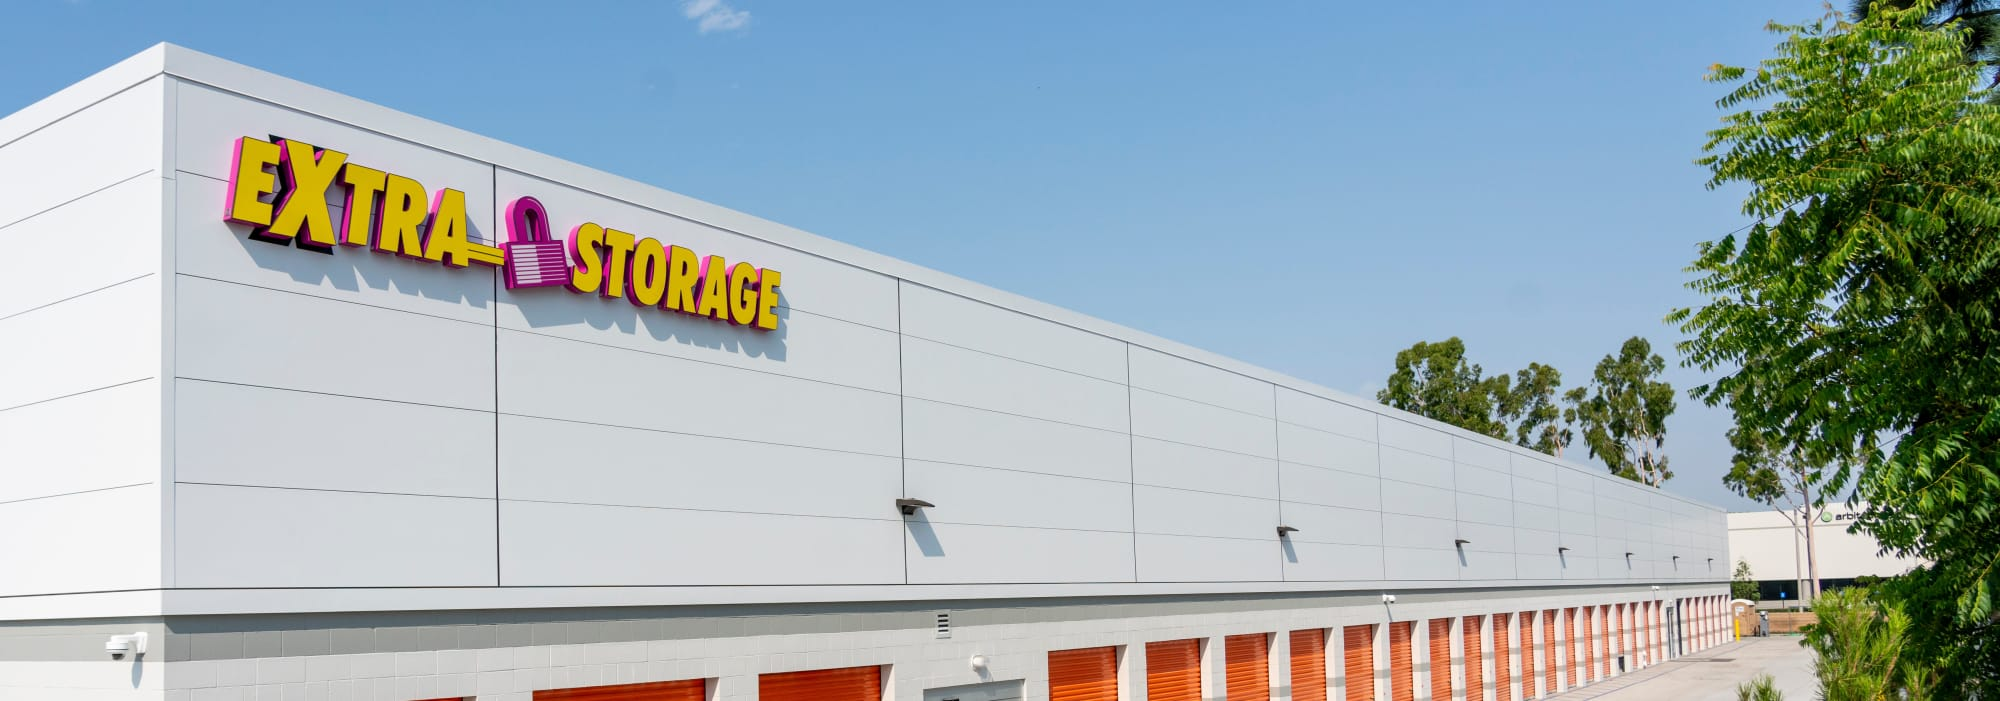 Extra Storage Irvine in Irvine, California